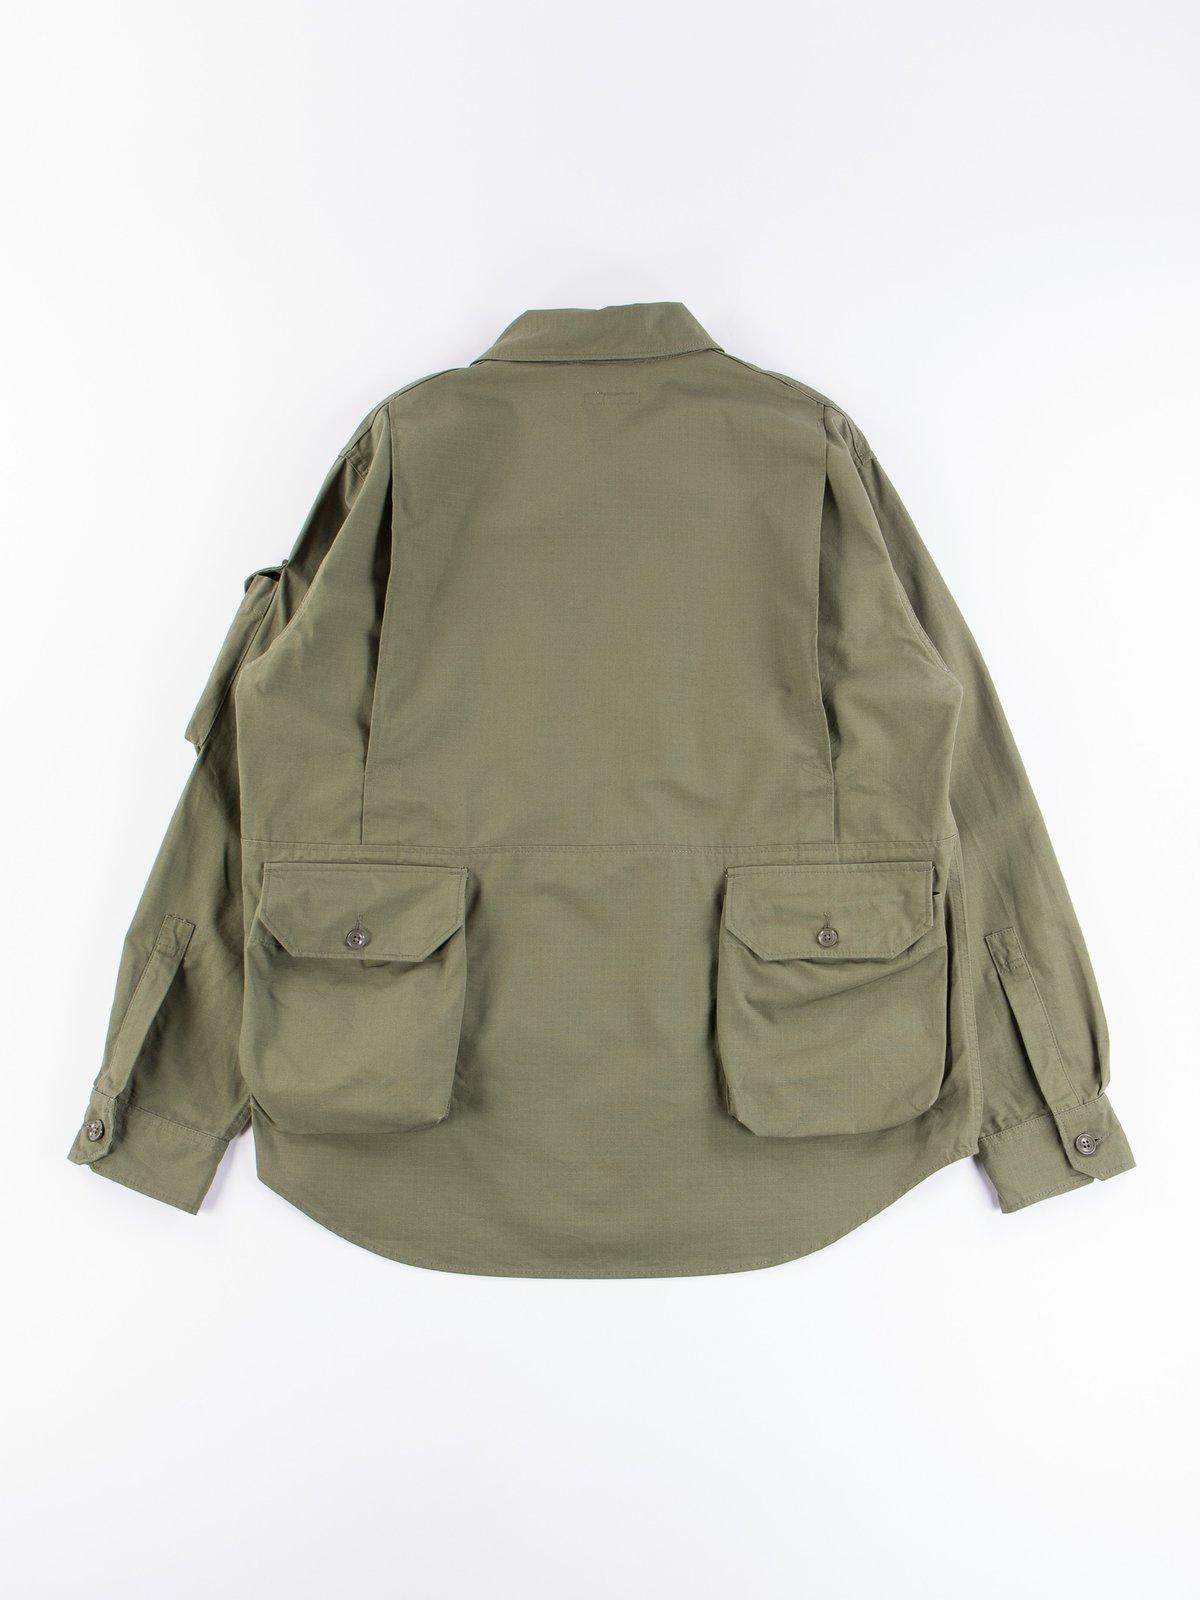 Olive Cotton Ripstop Explorer Shirt Jacket - Image 7